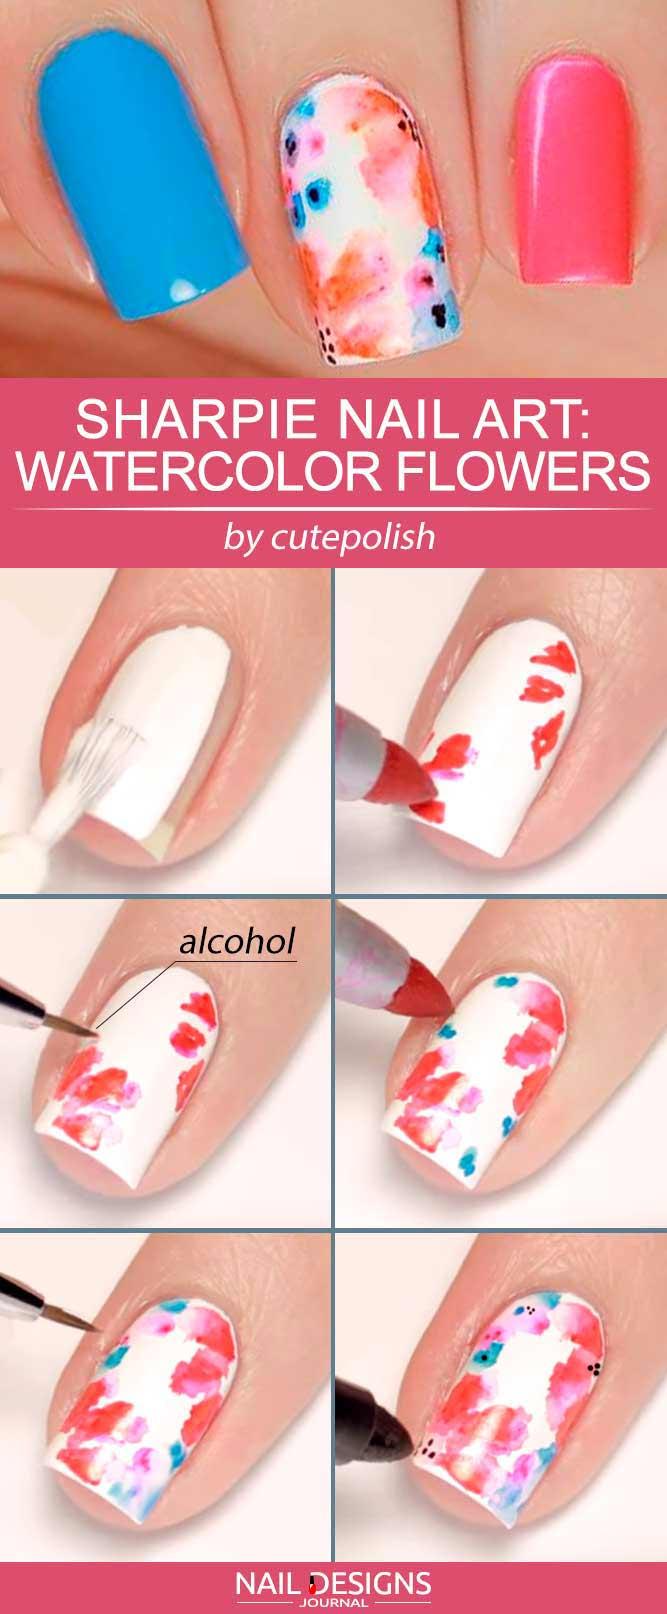 Sharpie Nail Art Ideas Tender Watercolor Flowers #watercolornails  #flowernails #floralnails - Sharpie Nail Art To Create A Masterpiece NailDesignsJournal.com